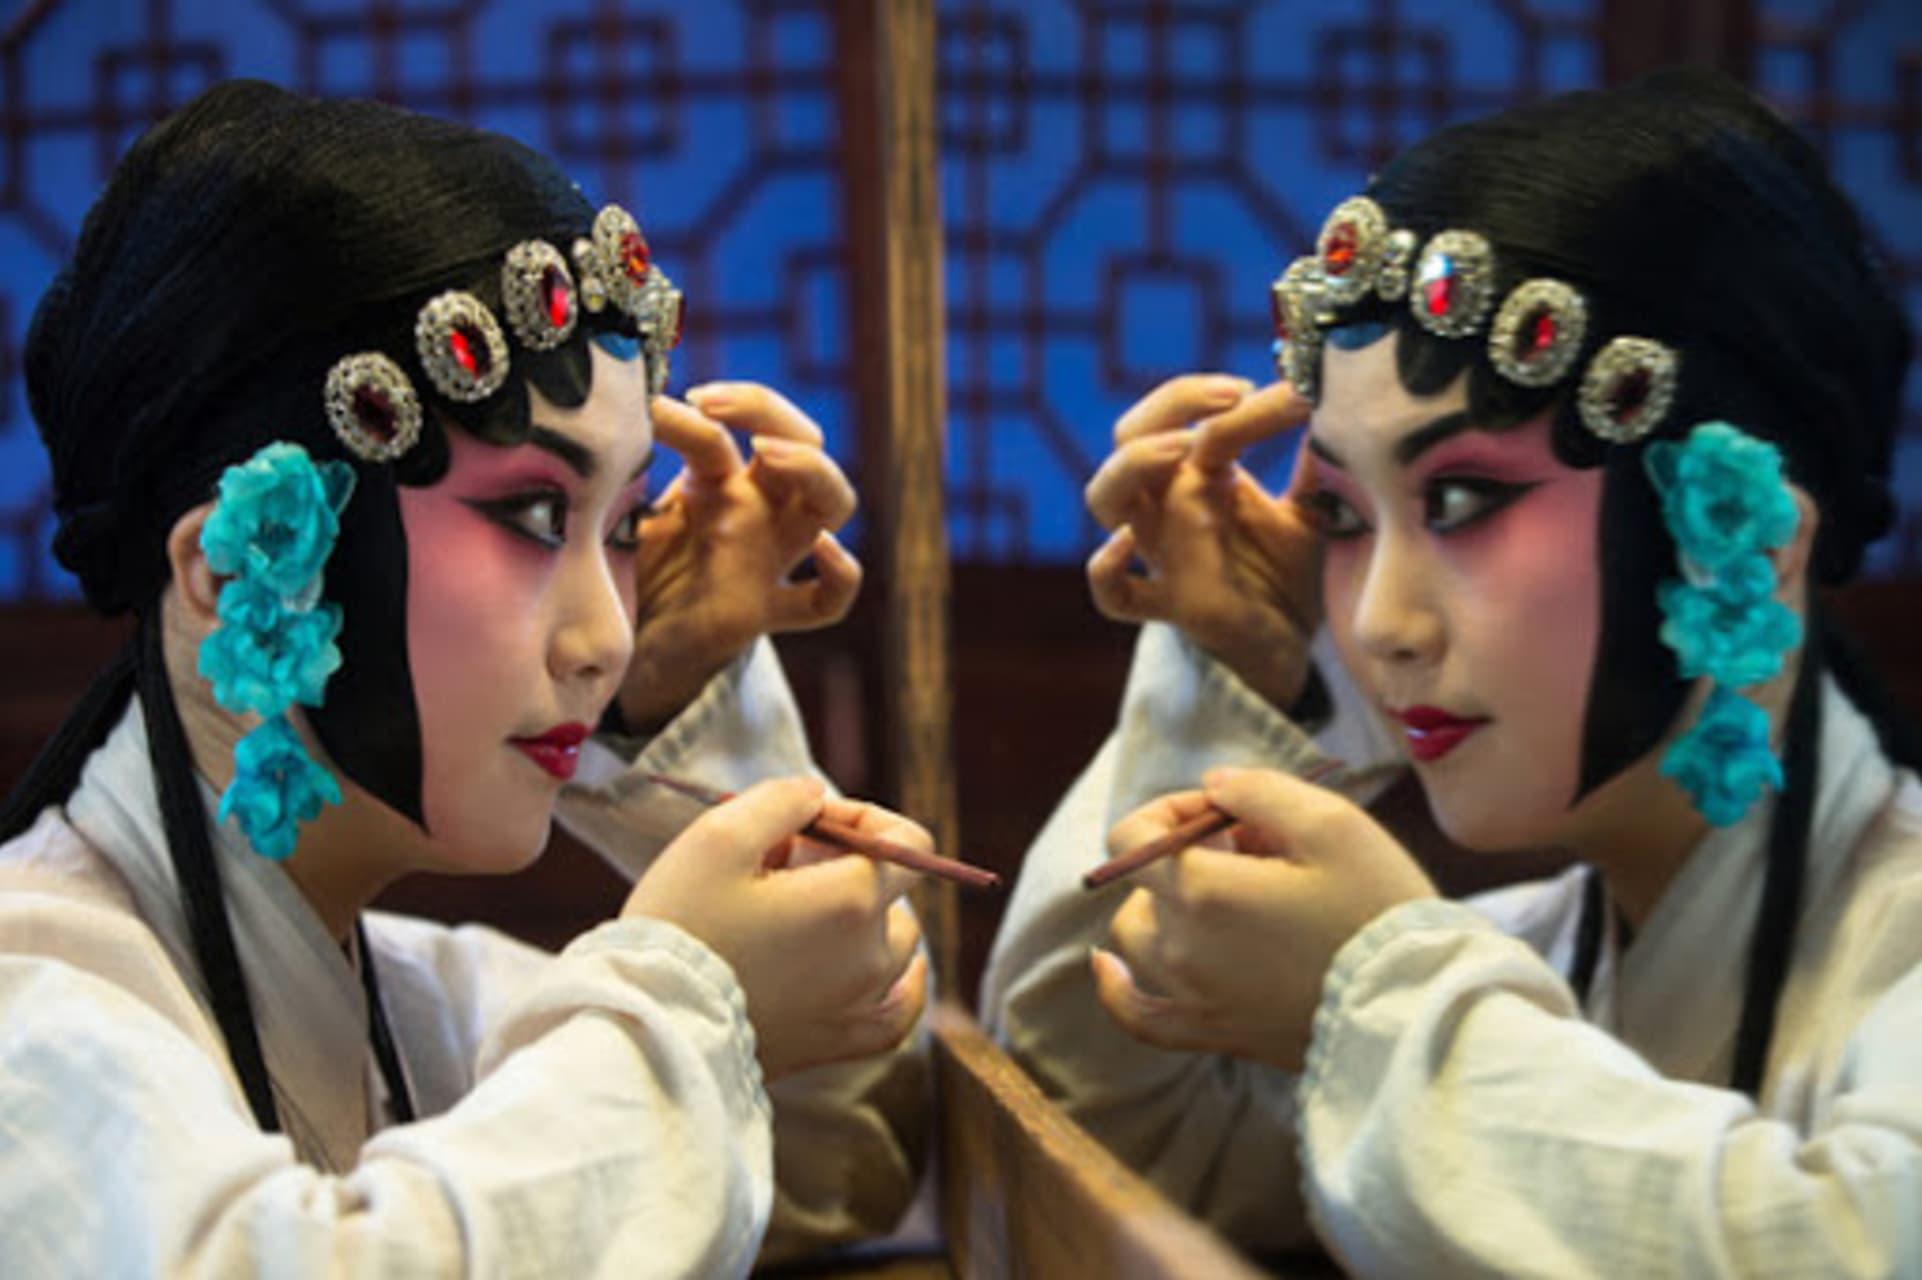 Chengdu - Culture Center of Chengdu: Backstage visit at Sichuan Opera House